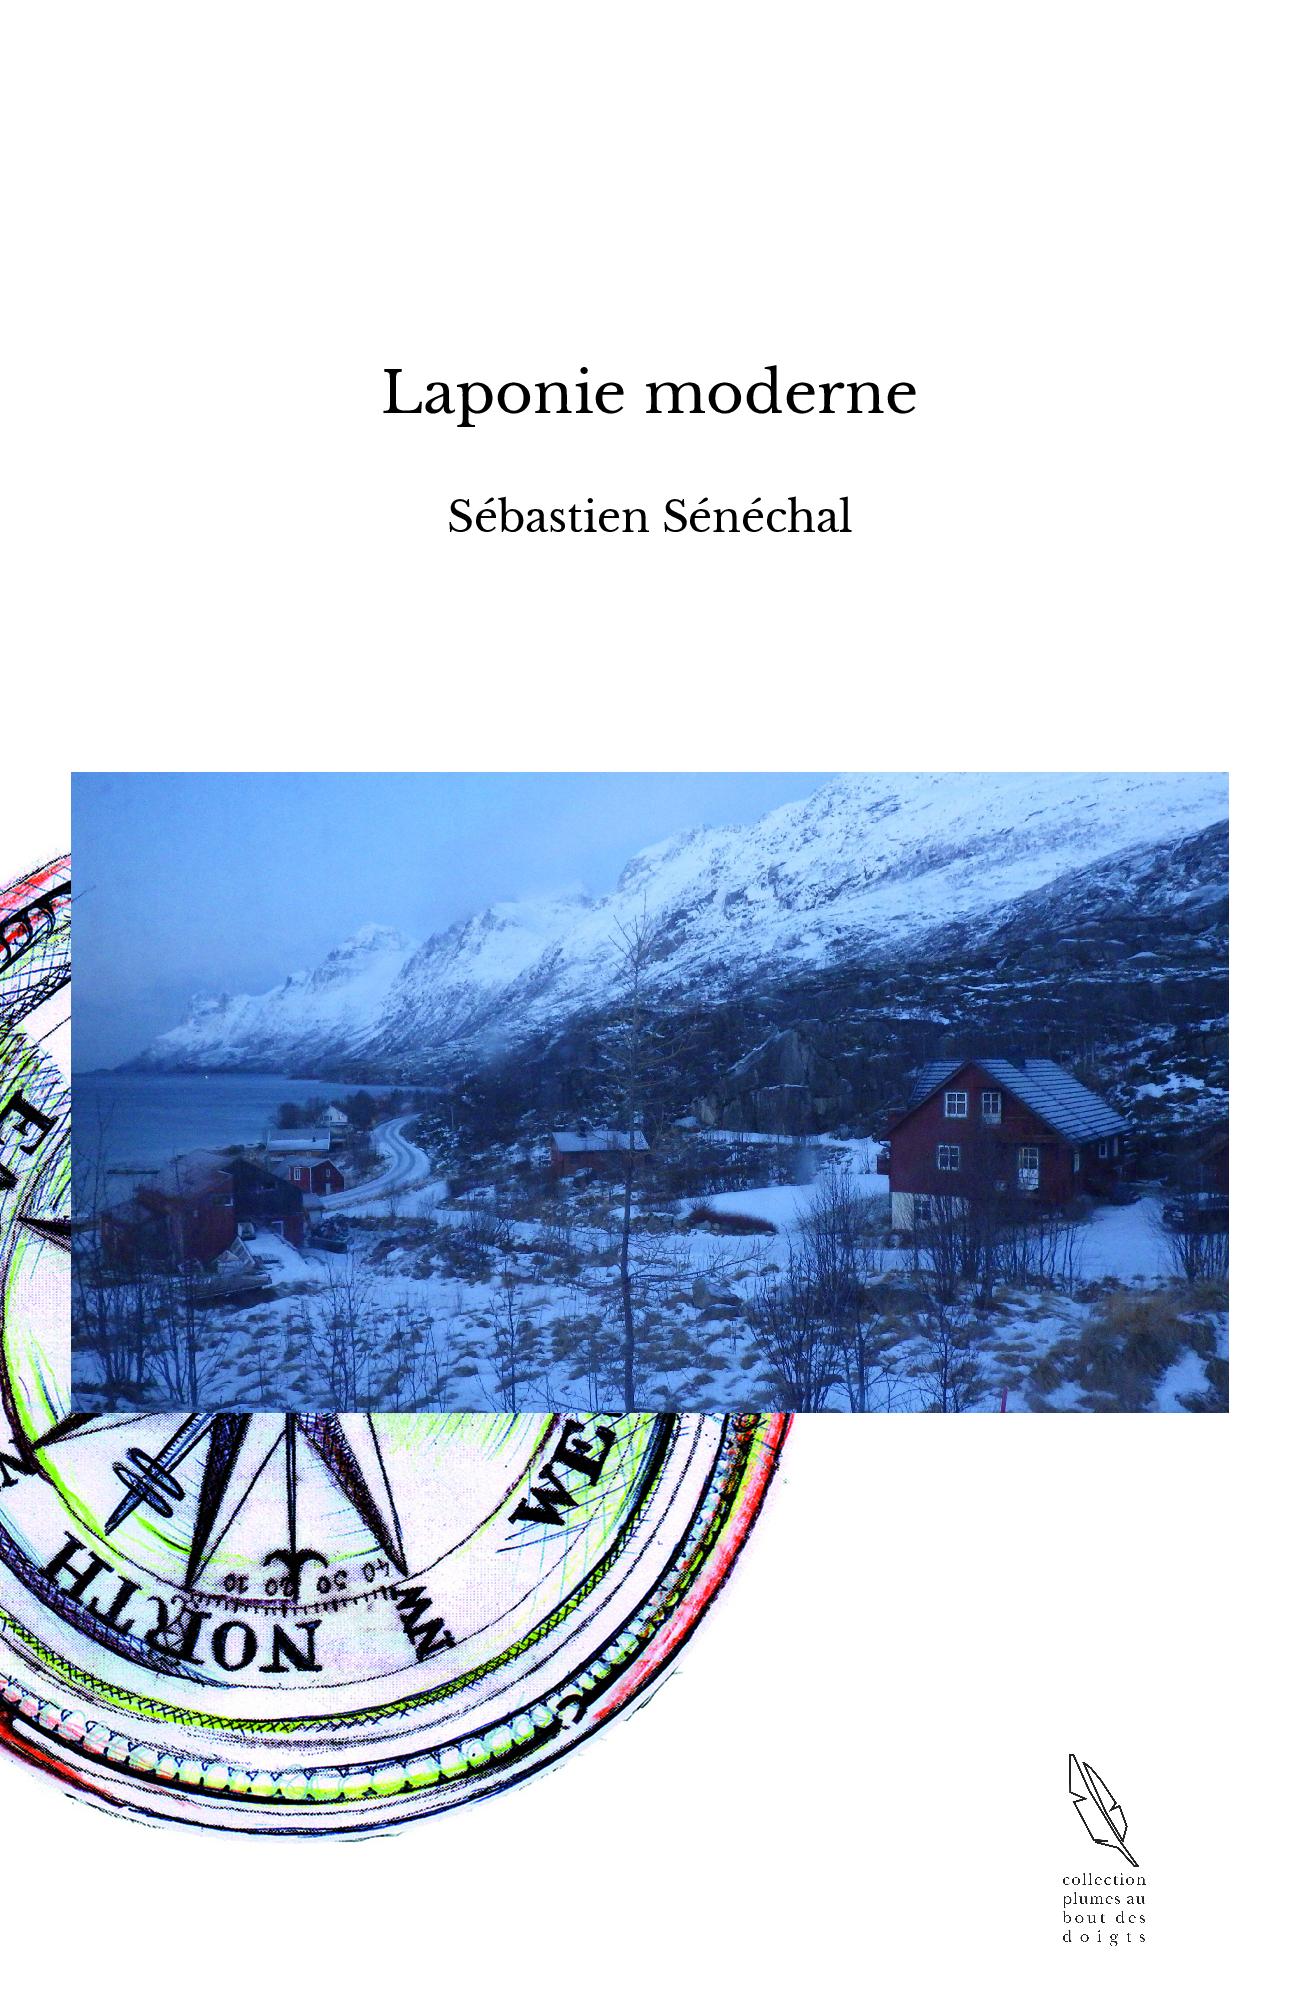 Laponie moderne